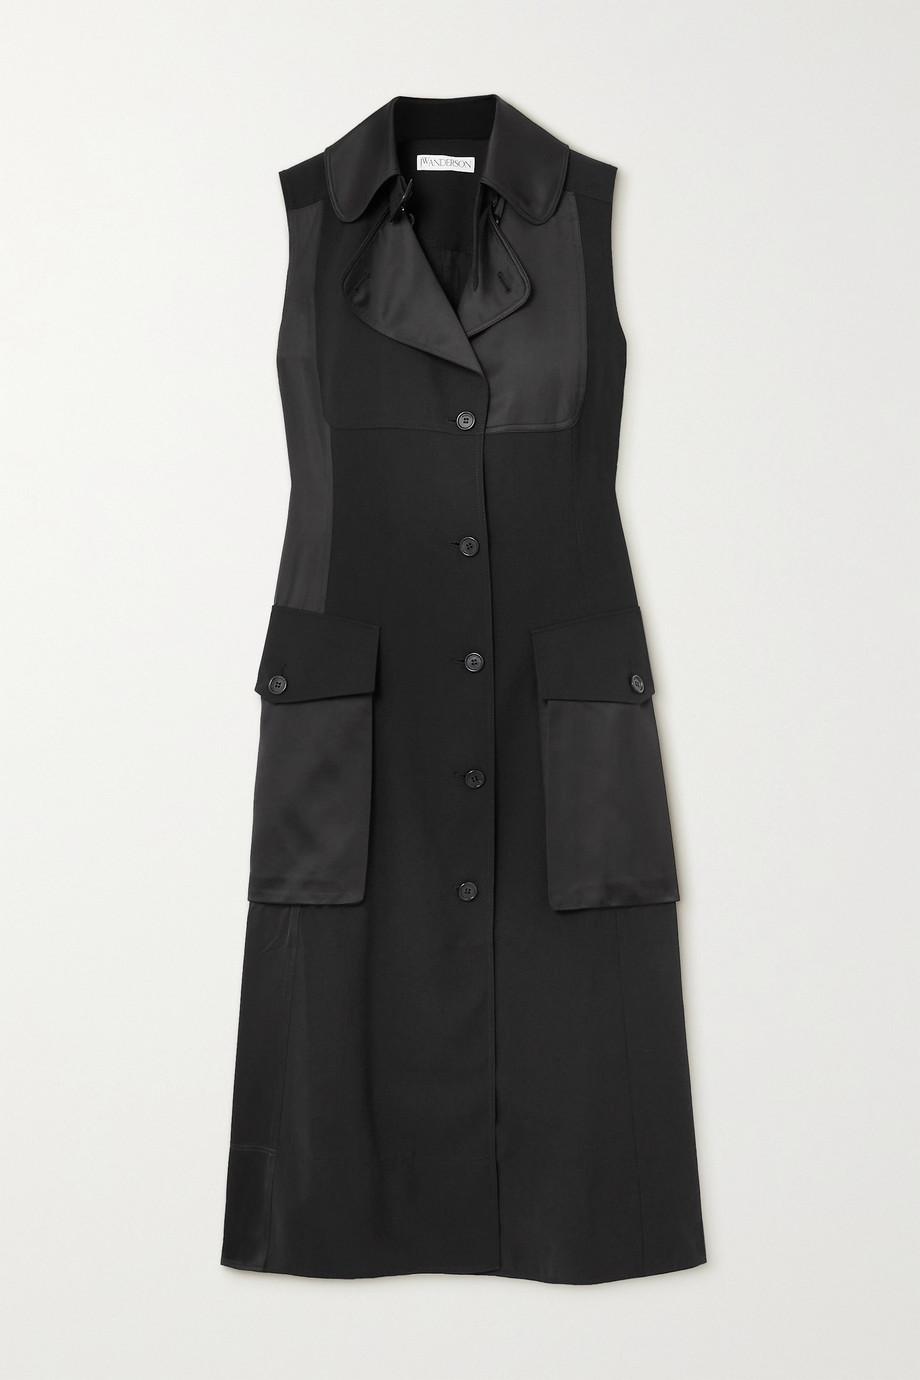 JW Anderson Satin-paneled crepe de chine midi dress